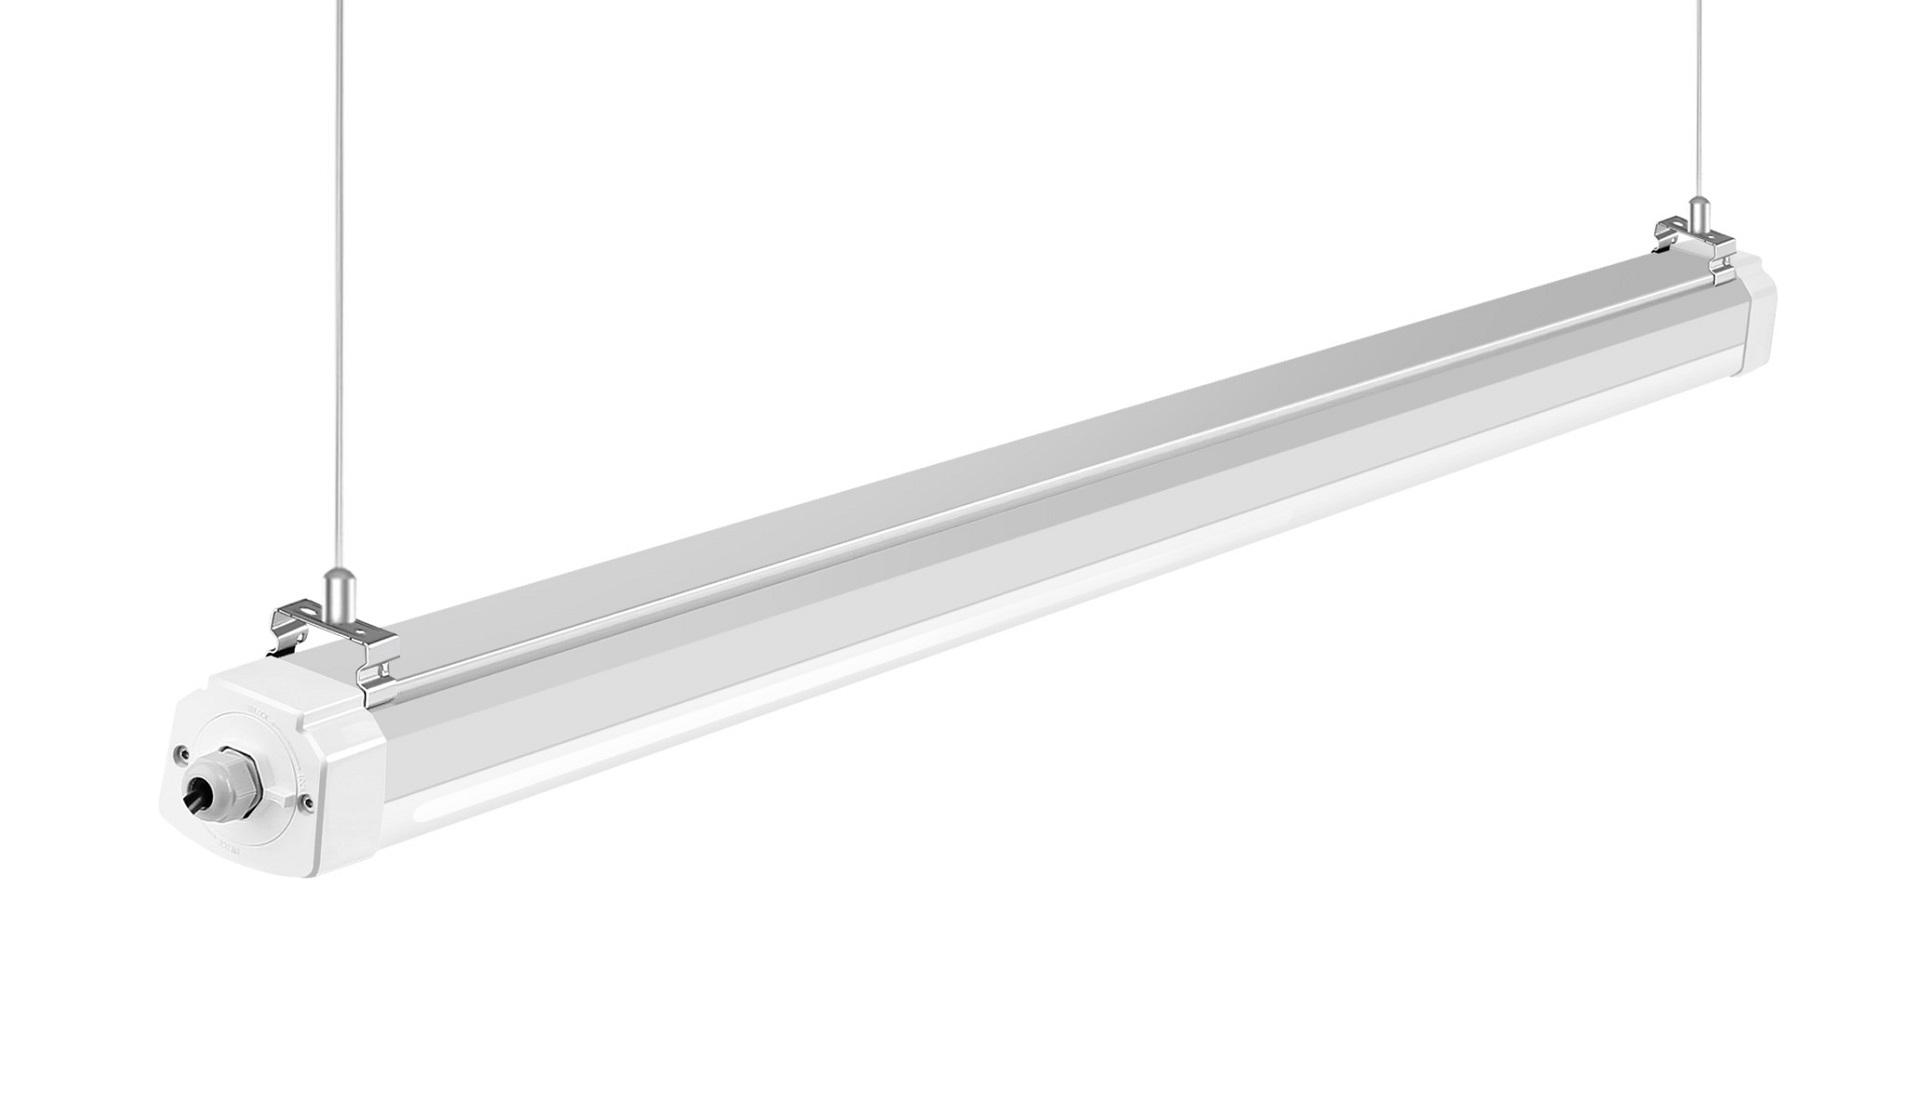 ip65 tri-proof led light fixture